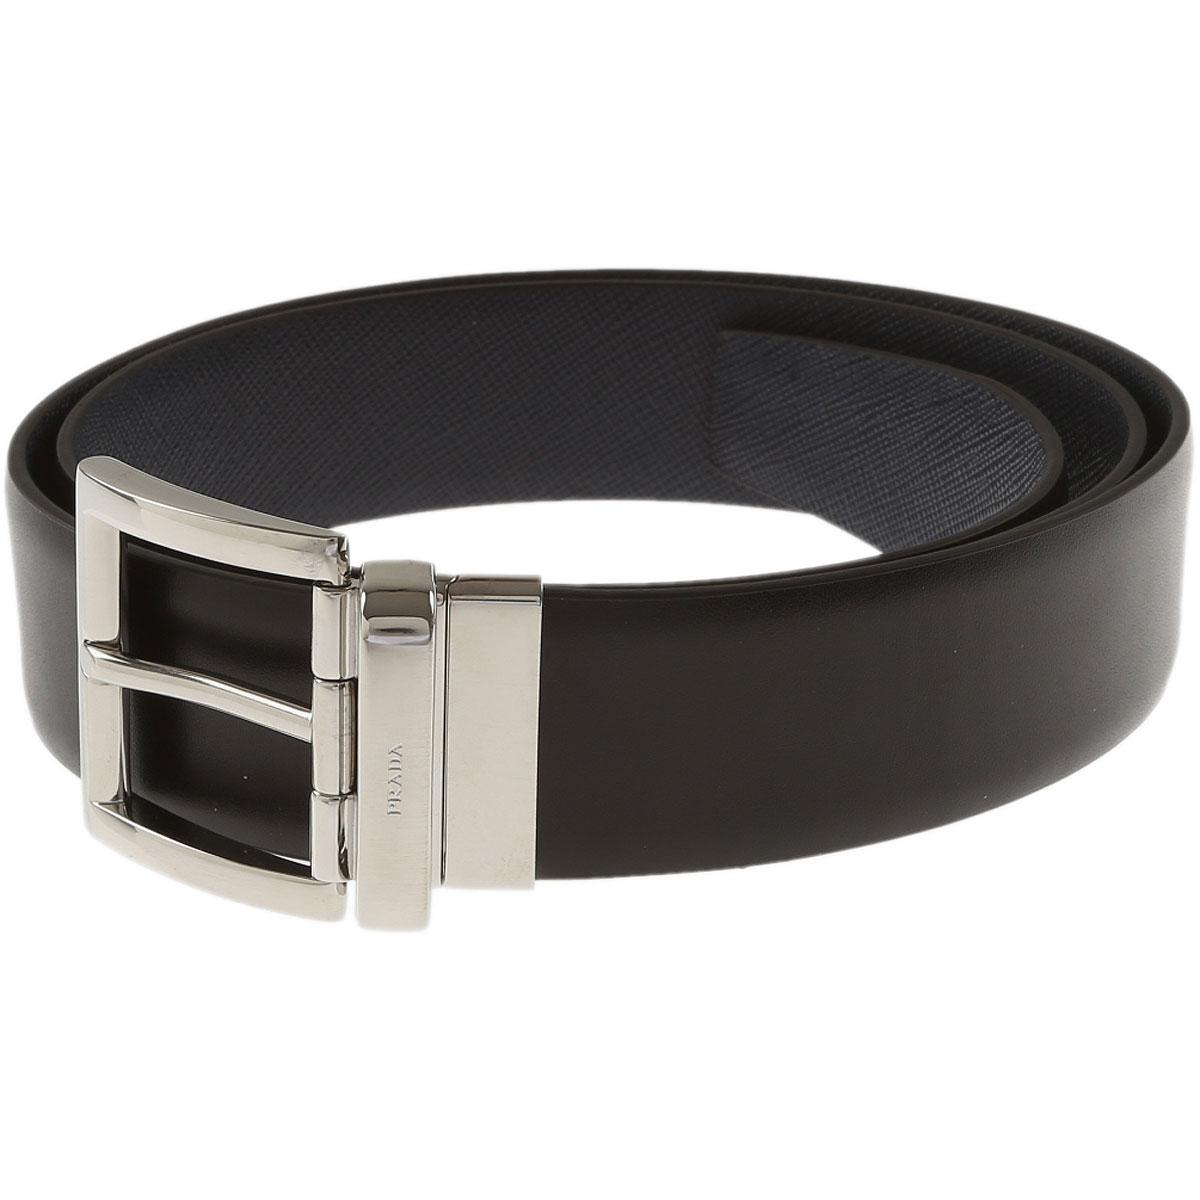 Prada Belts On Sale, Reversible, Black, Leather, 2019, 36 38 40